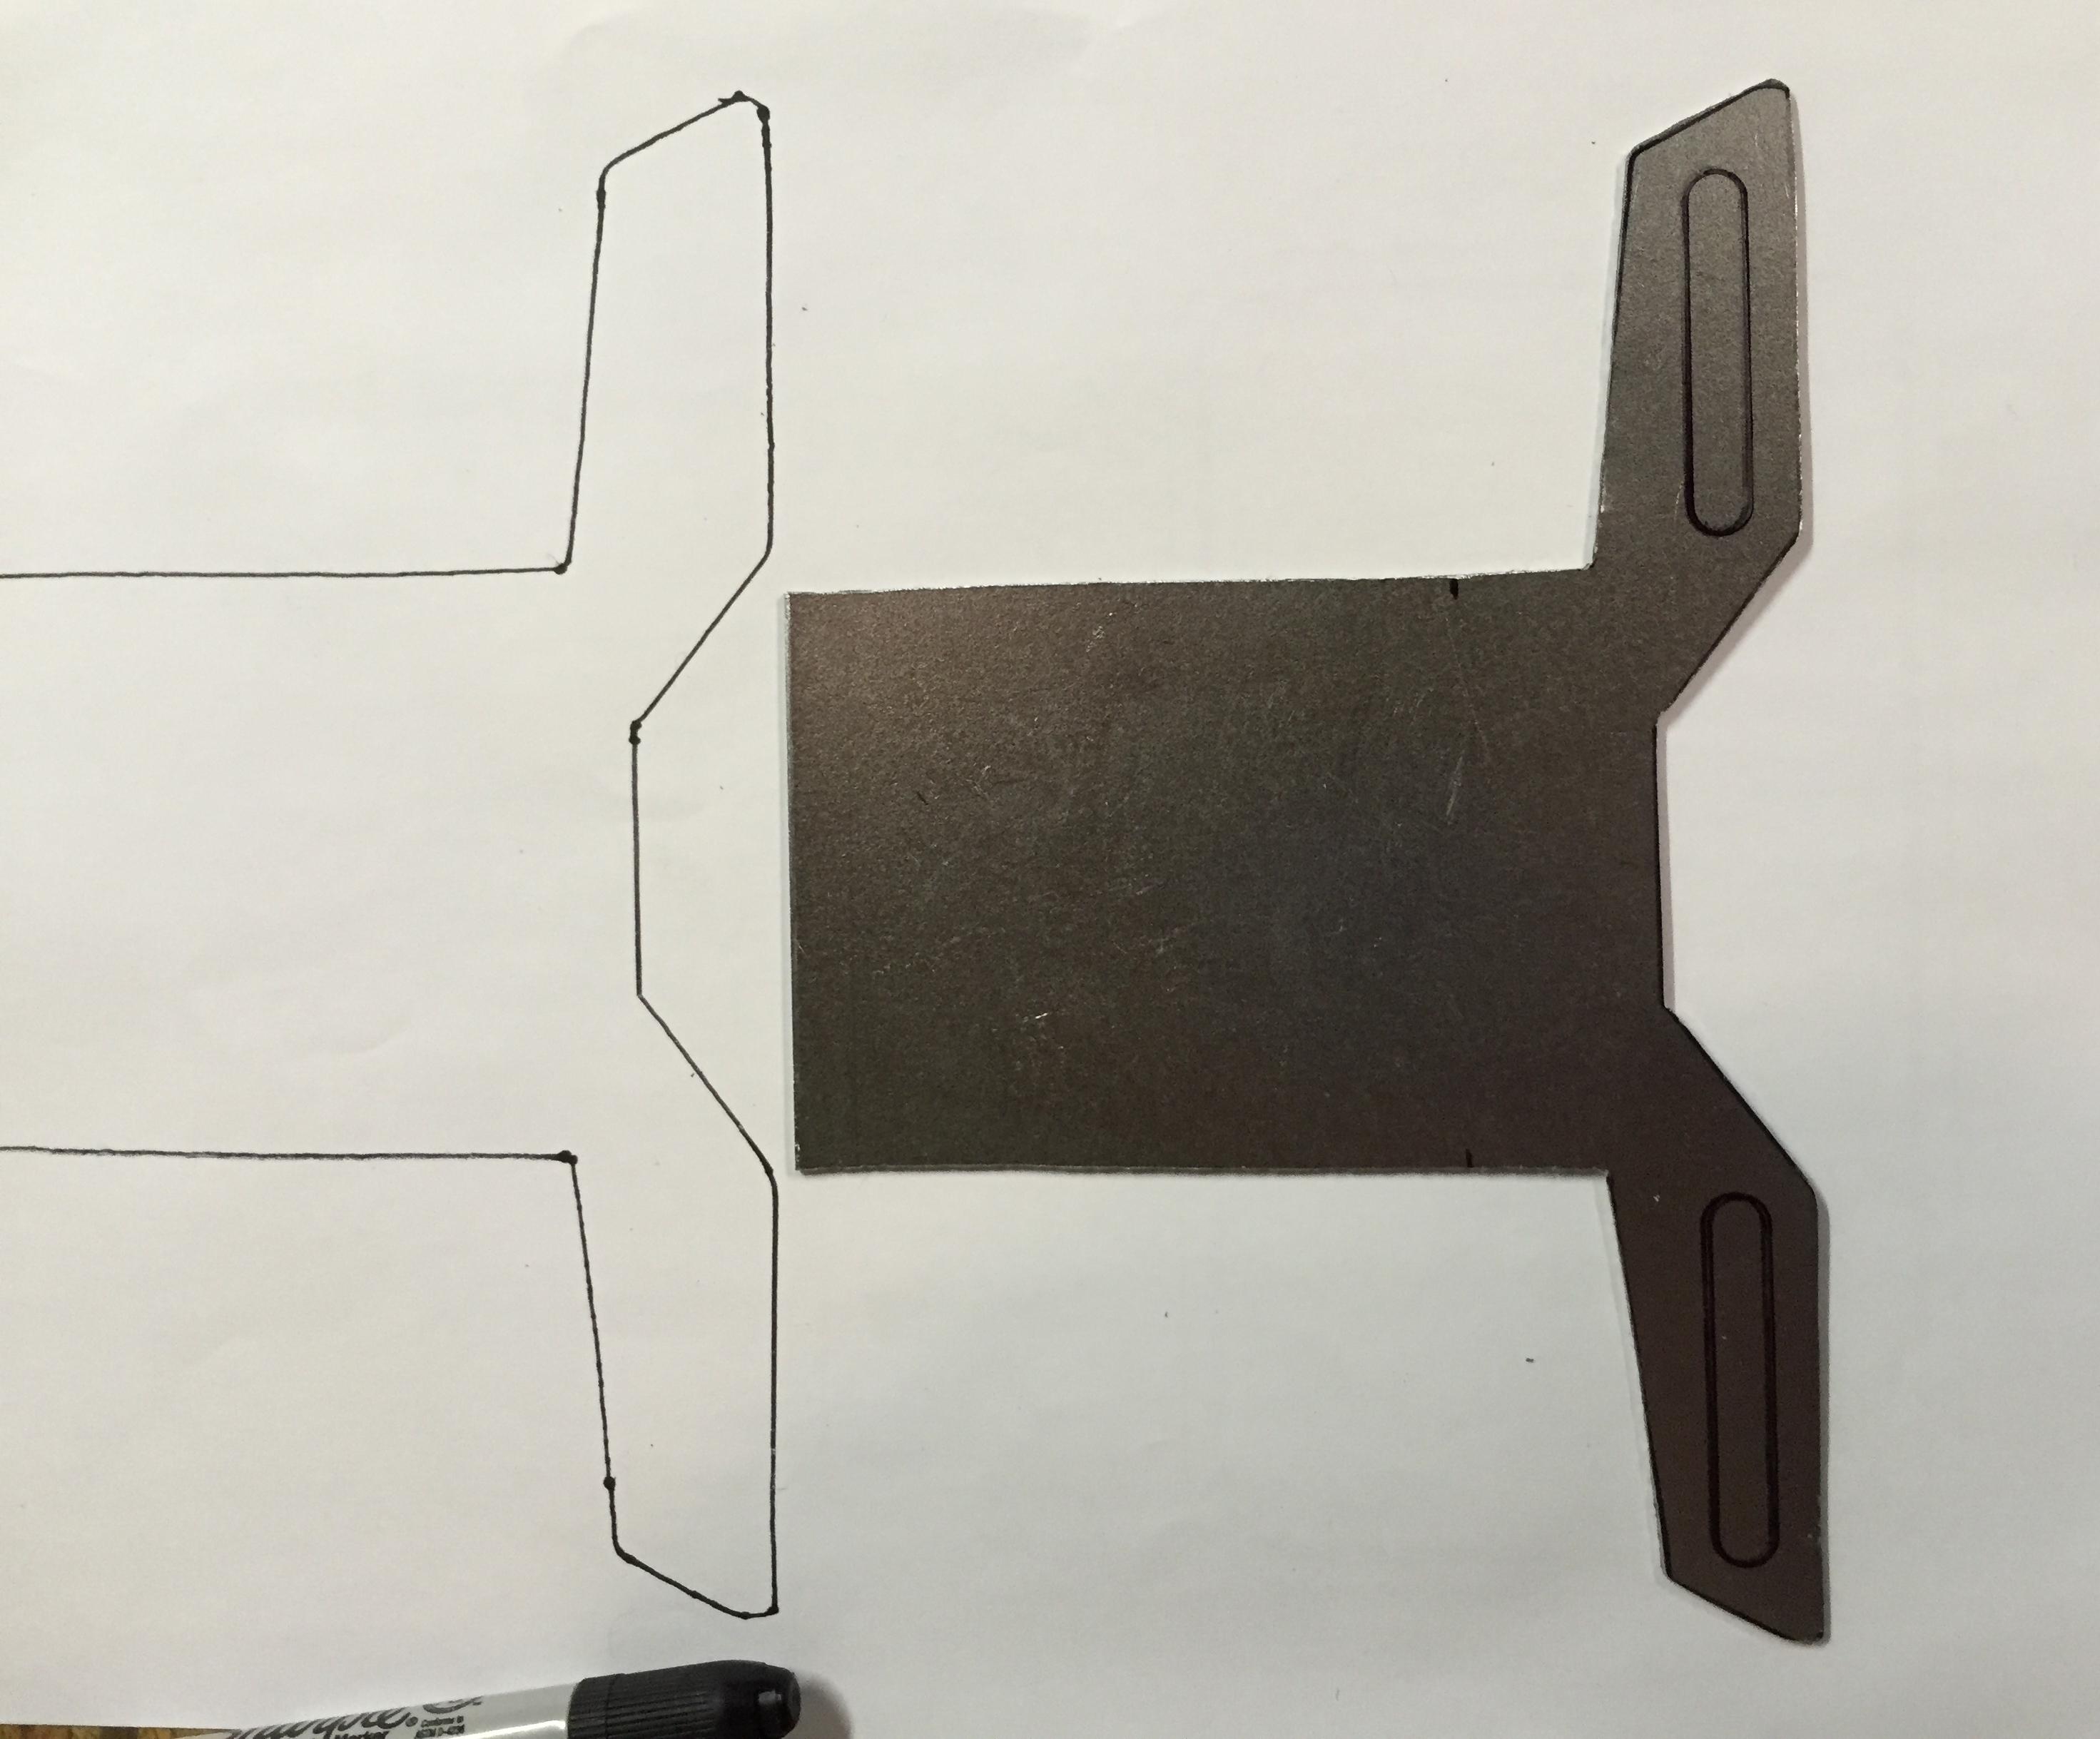 Rsx 850 860 License Plate Bracket John Deere Gator Forums